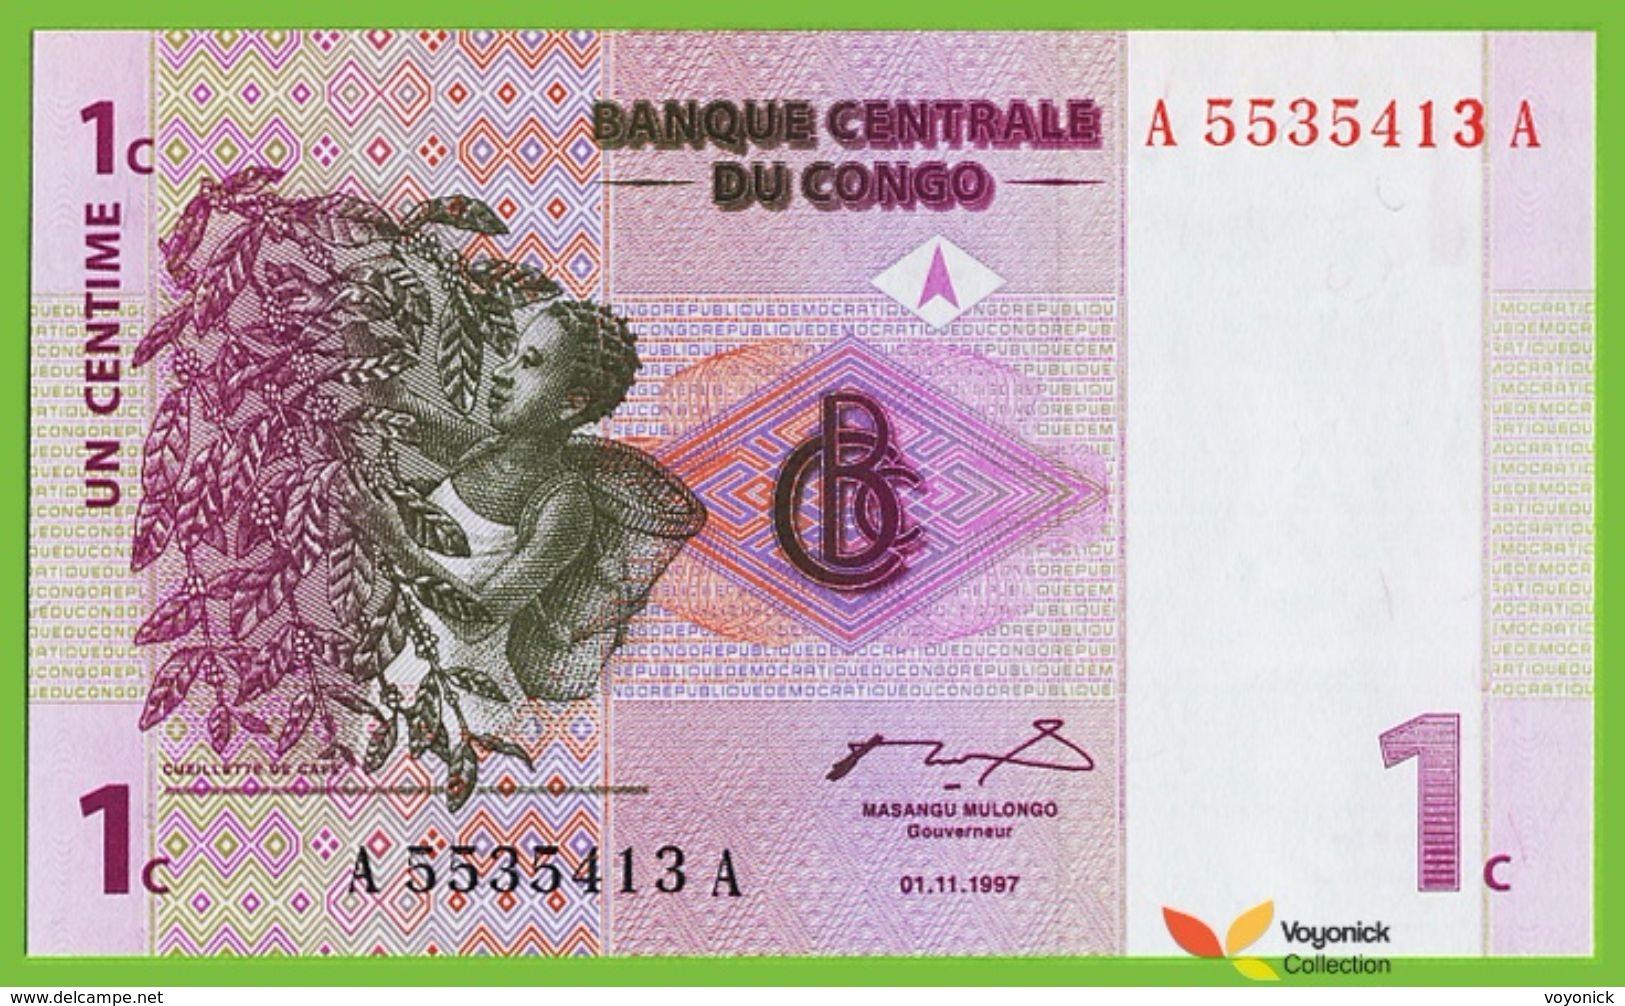 Voyo CONGO 1 Centime 1997 P80a  B301a Prefix A Surfix A UNC Coffee  Volcano - Congo